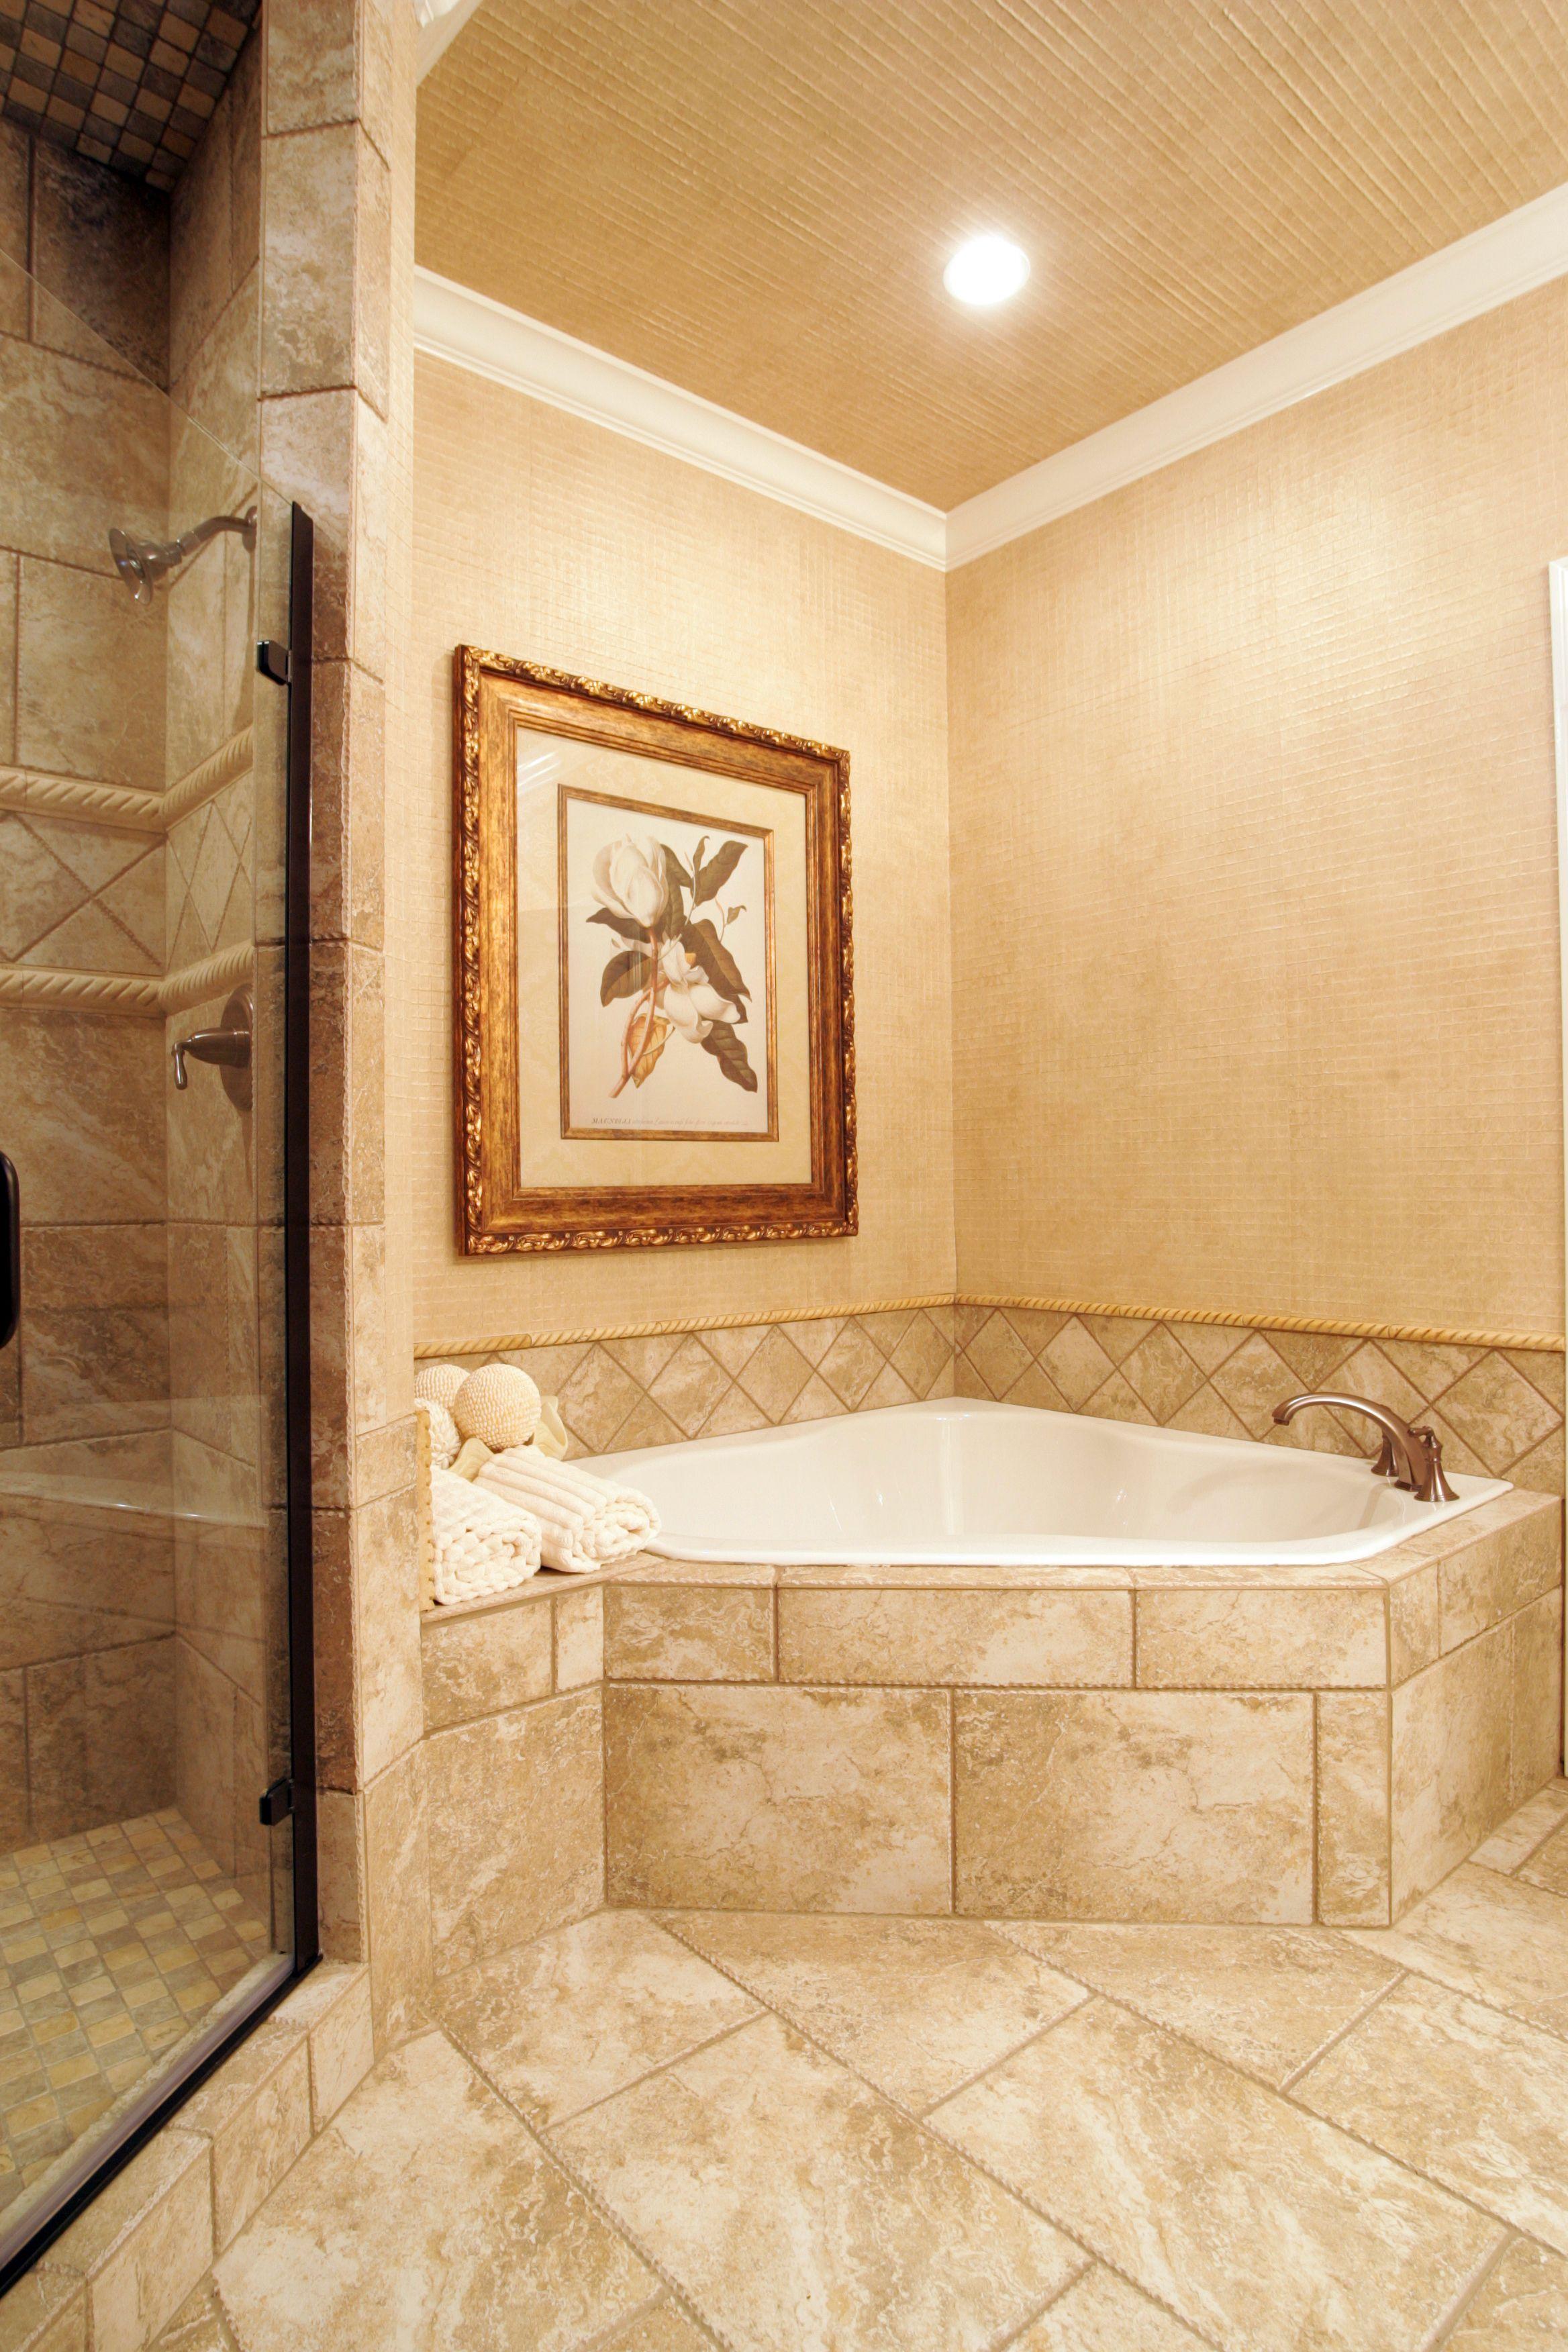 Corner soaking tub with tile surround bathrooms pinterest for Bathroom ideas with corner tub